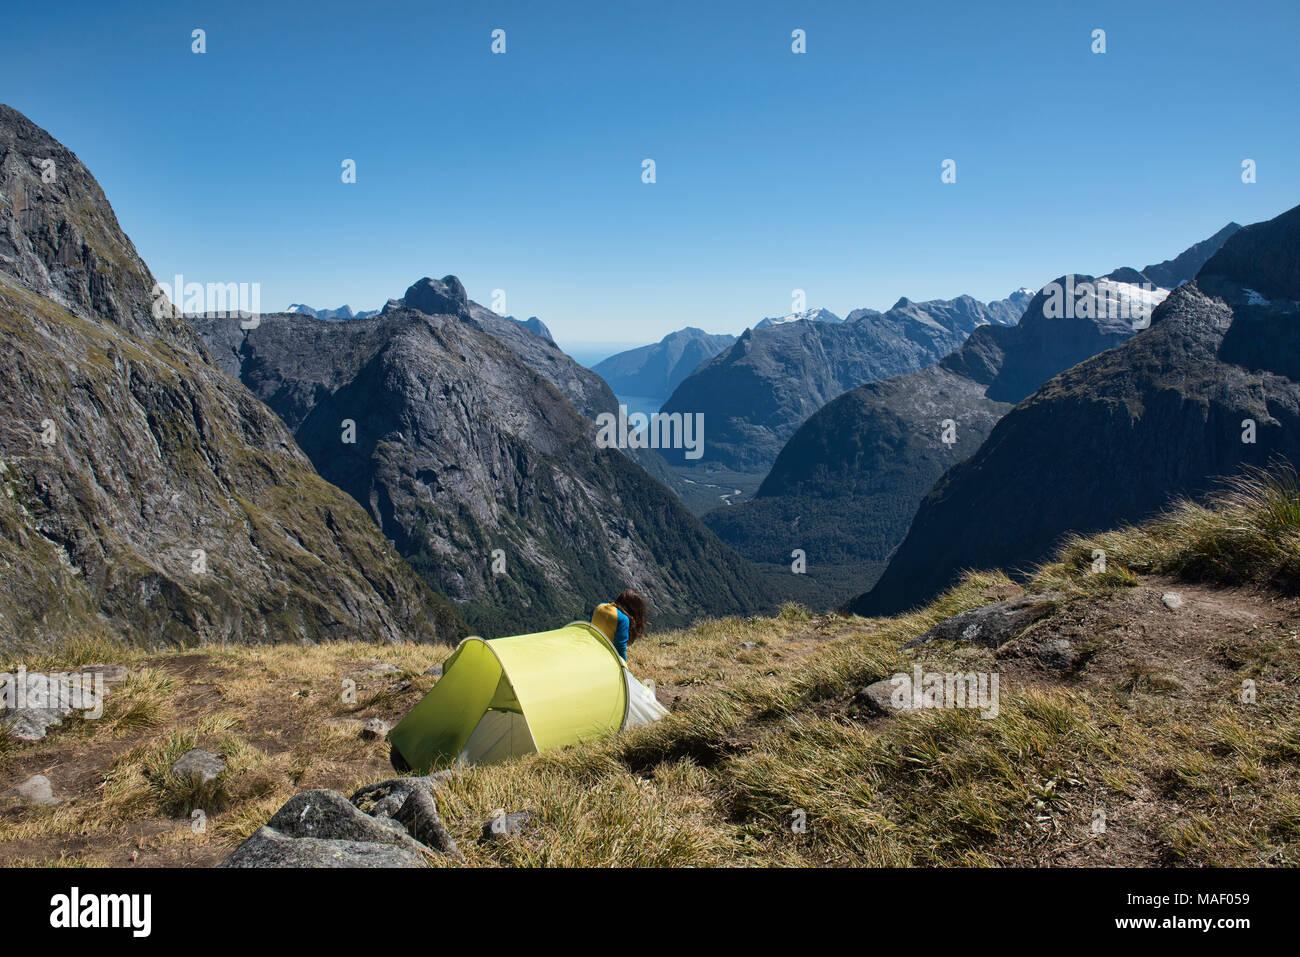 Super Campingplatz auf der Gertrude Sattel, Fjordland, Neuseeland Stockbild